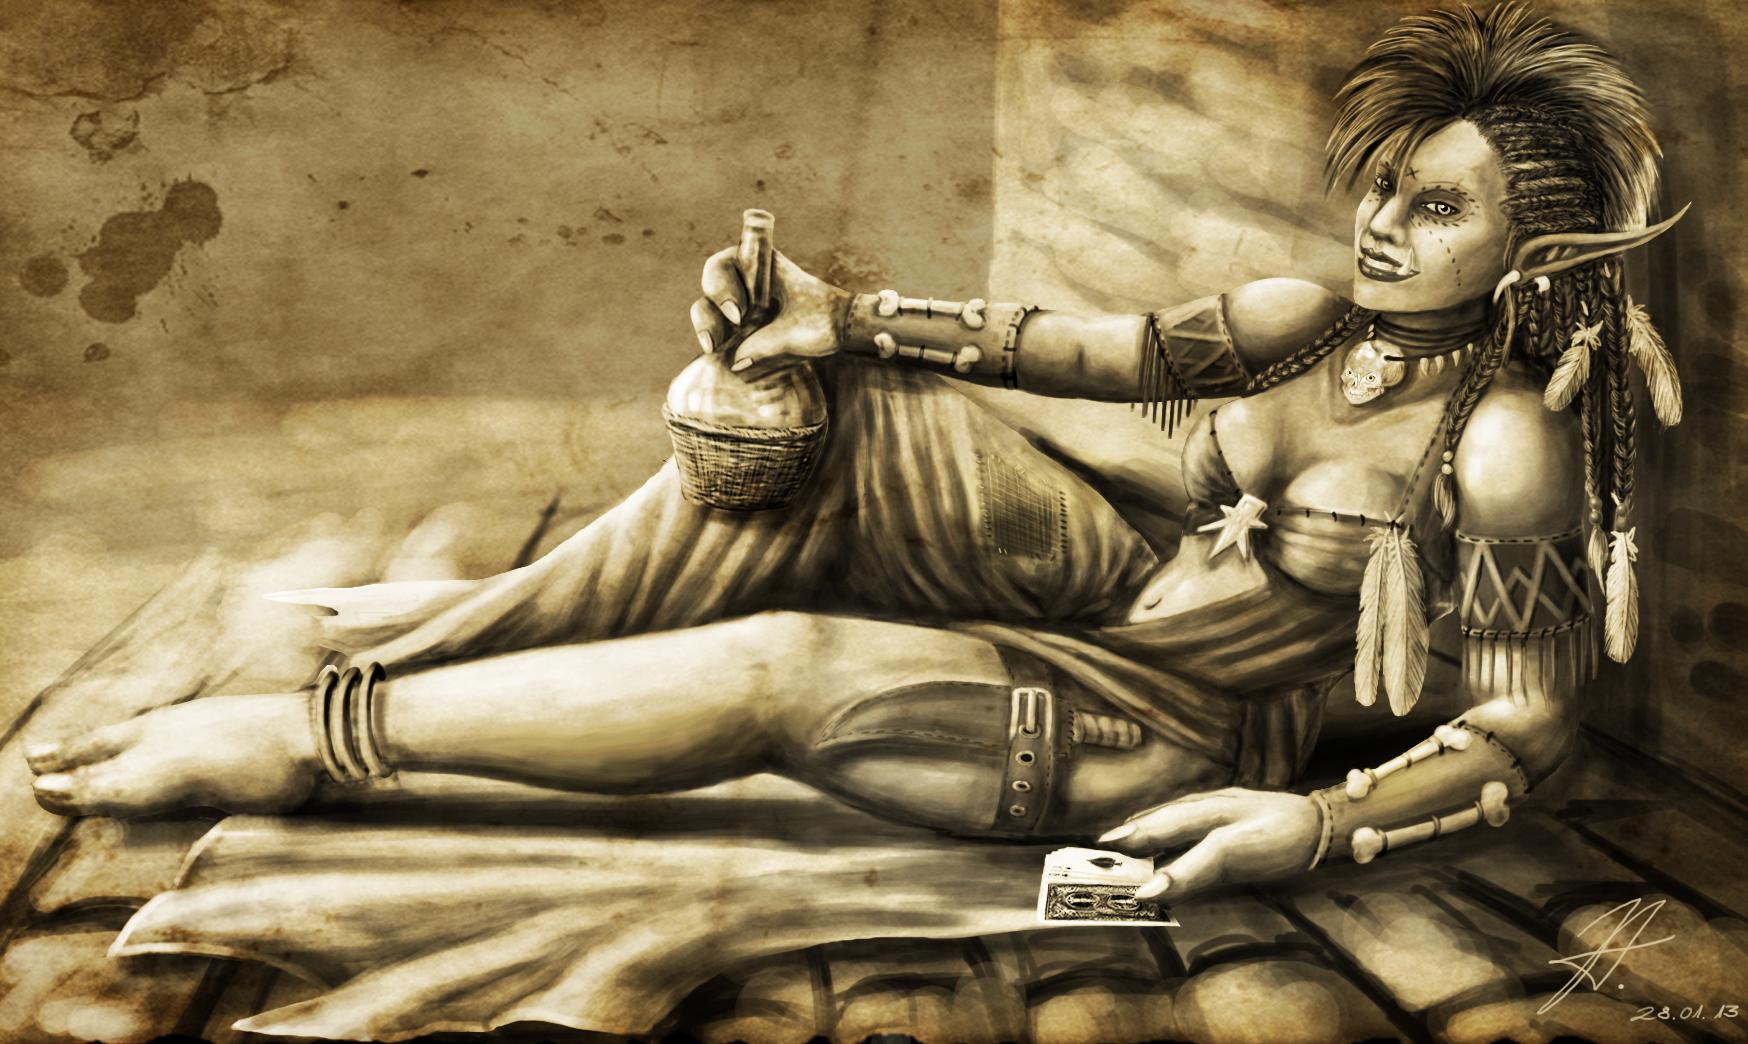 ghedeni_the_gambling_troll_by_niahawk-d5t083o.png (1748×1044)